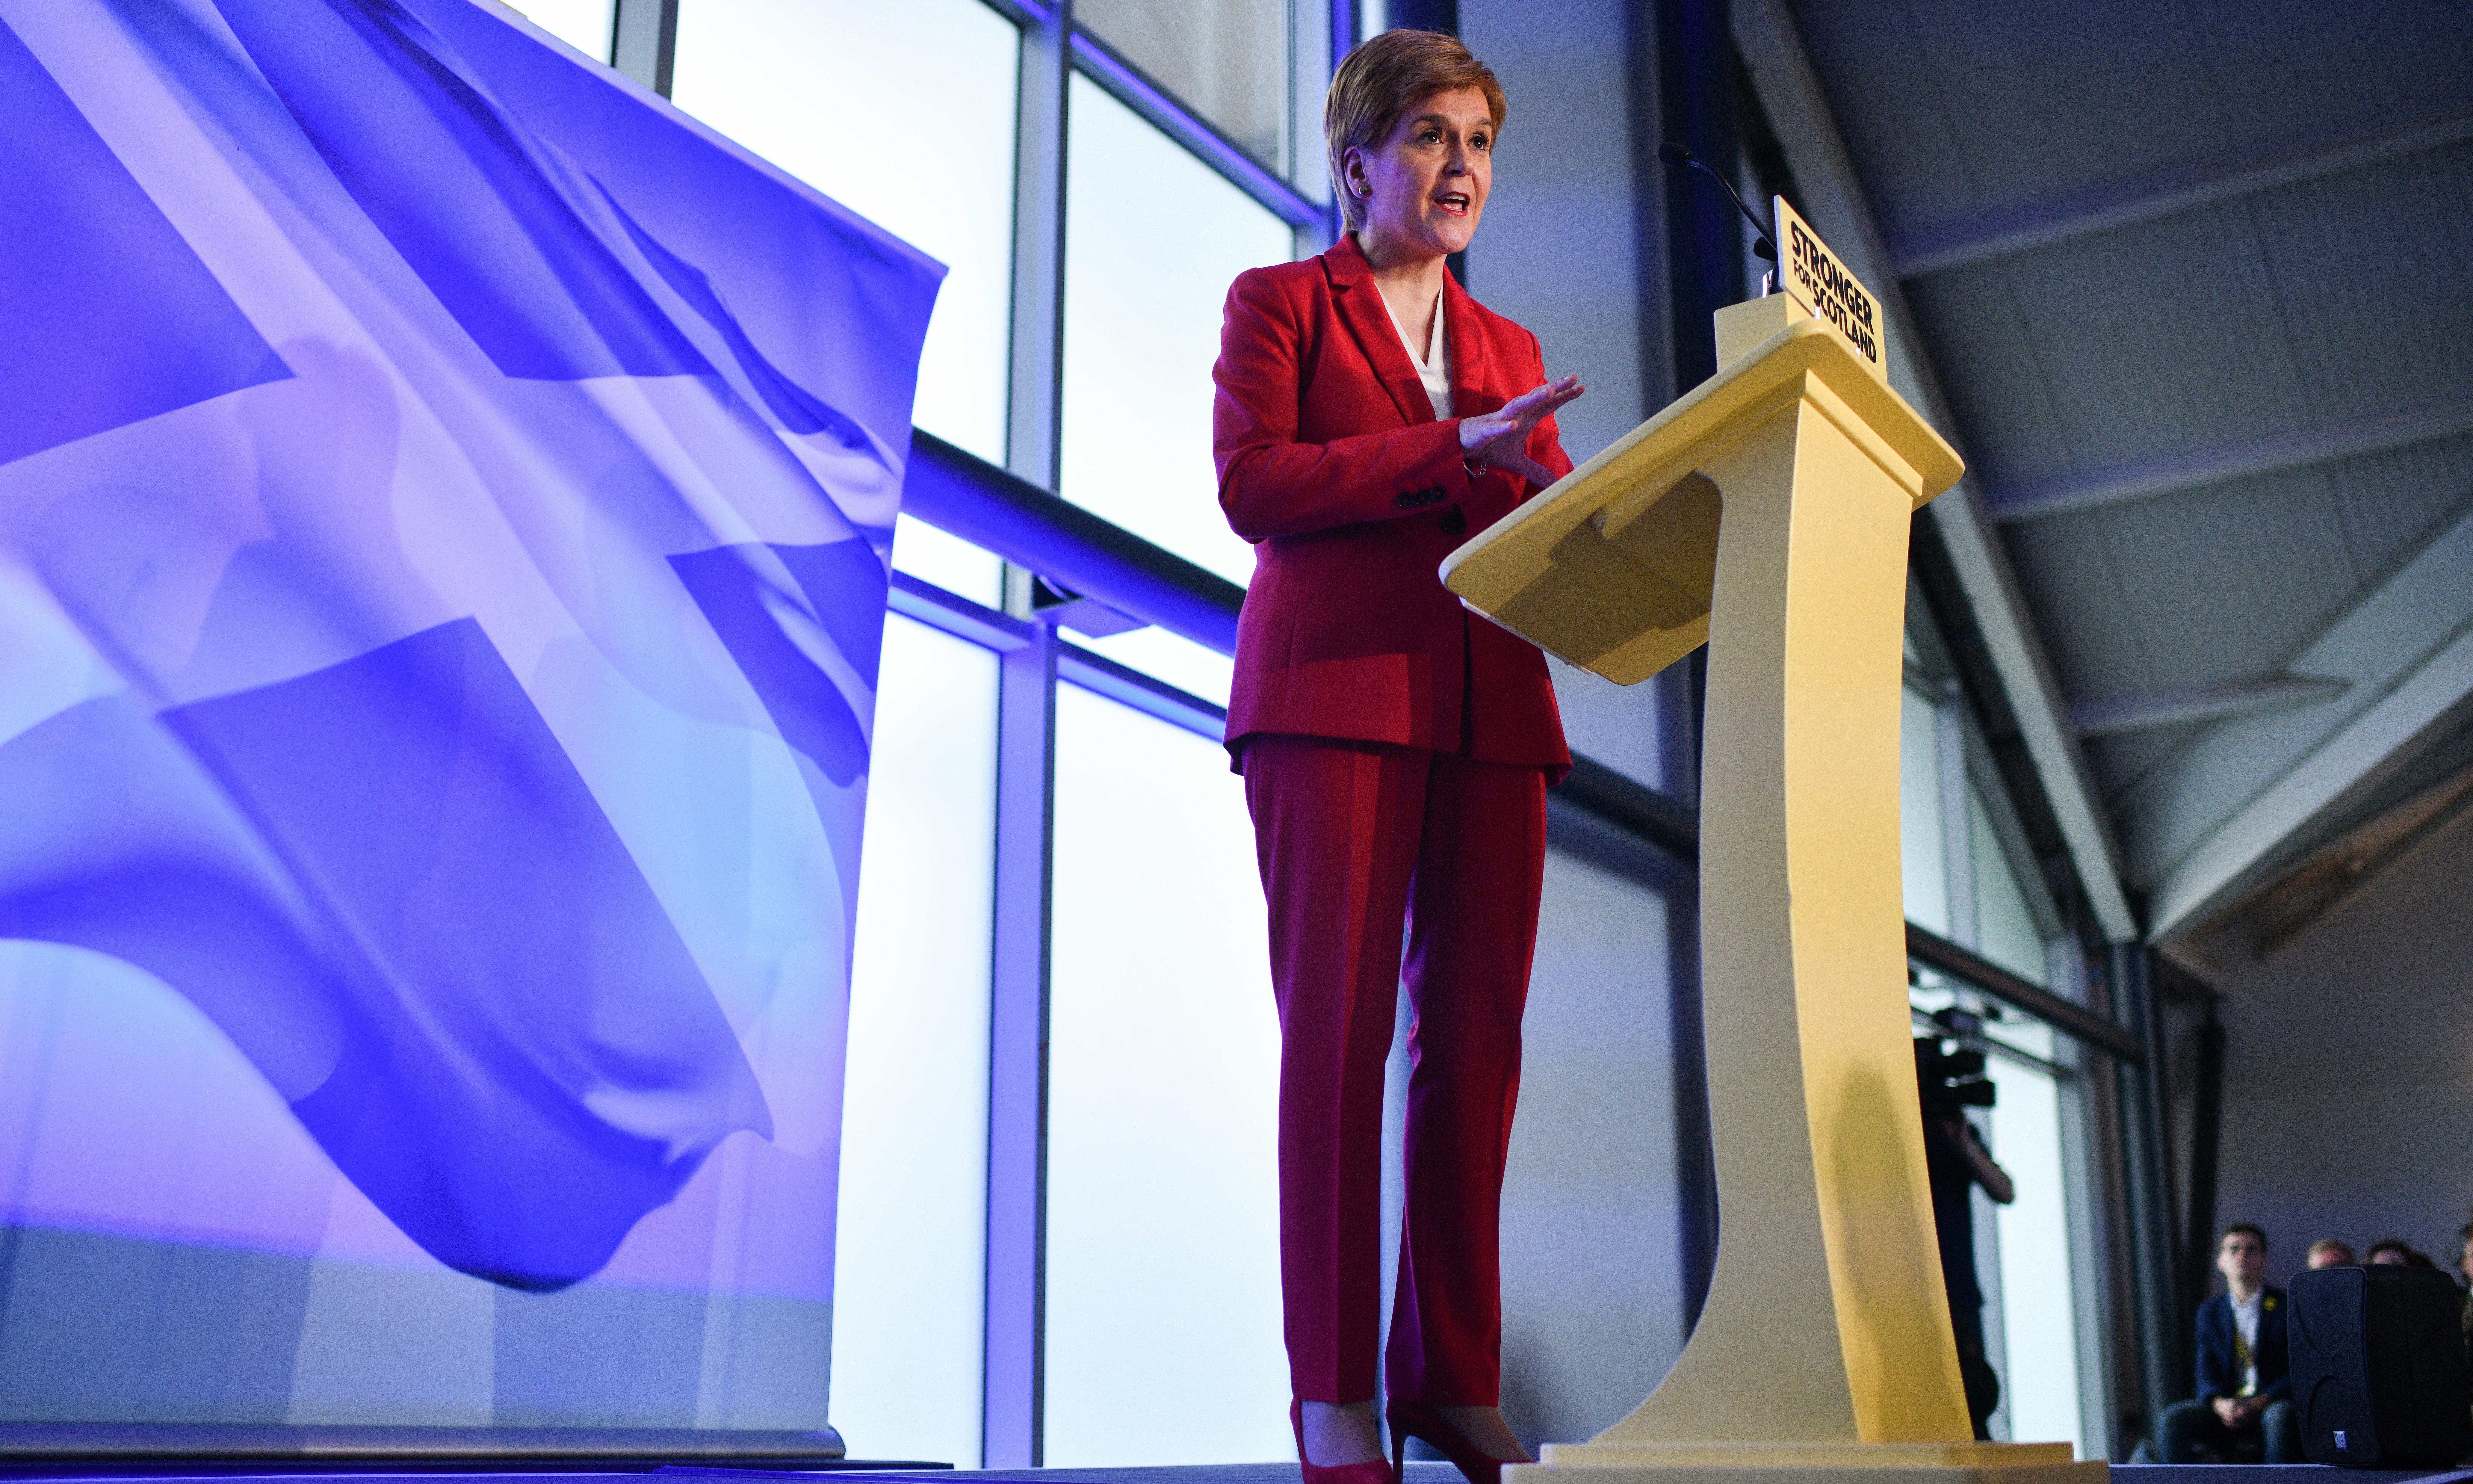 No deal made with Labour on Scottish referendum, says Nicola Sturgeon